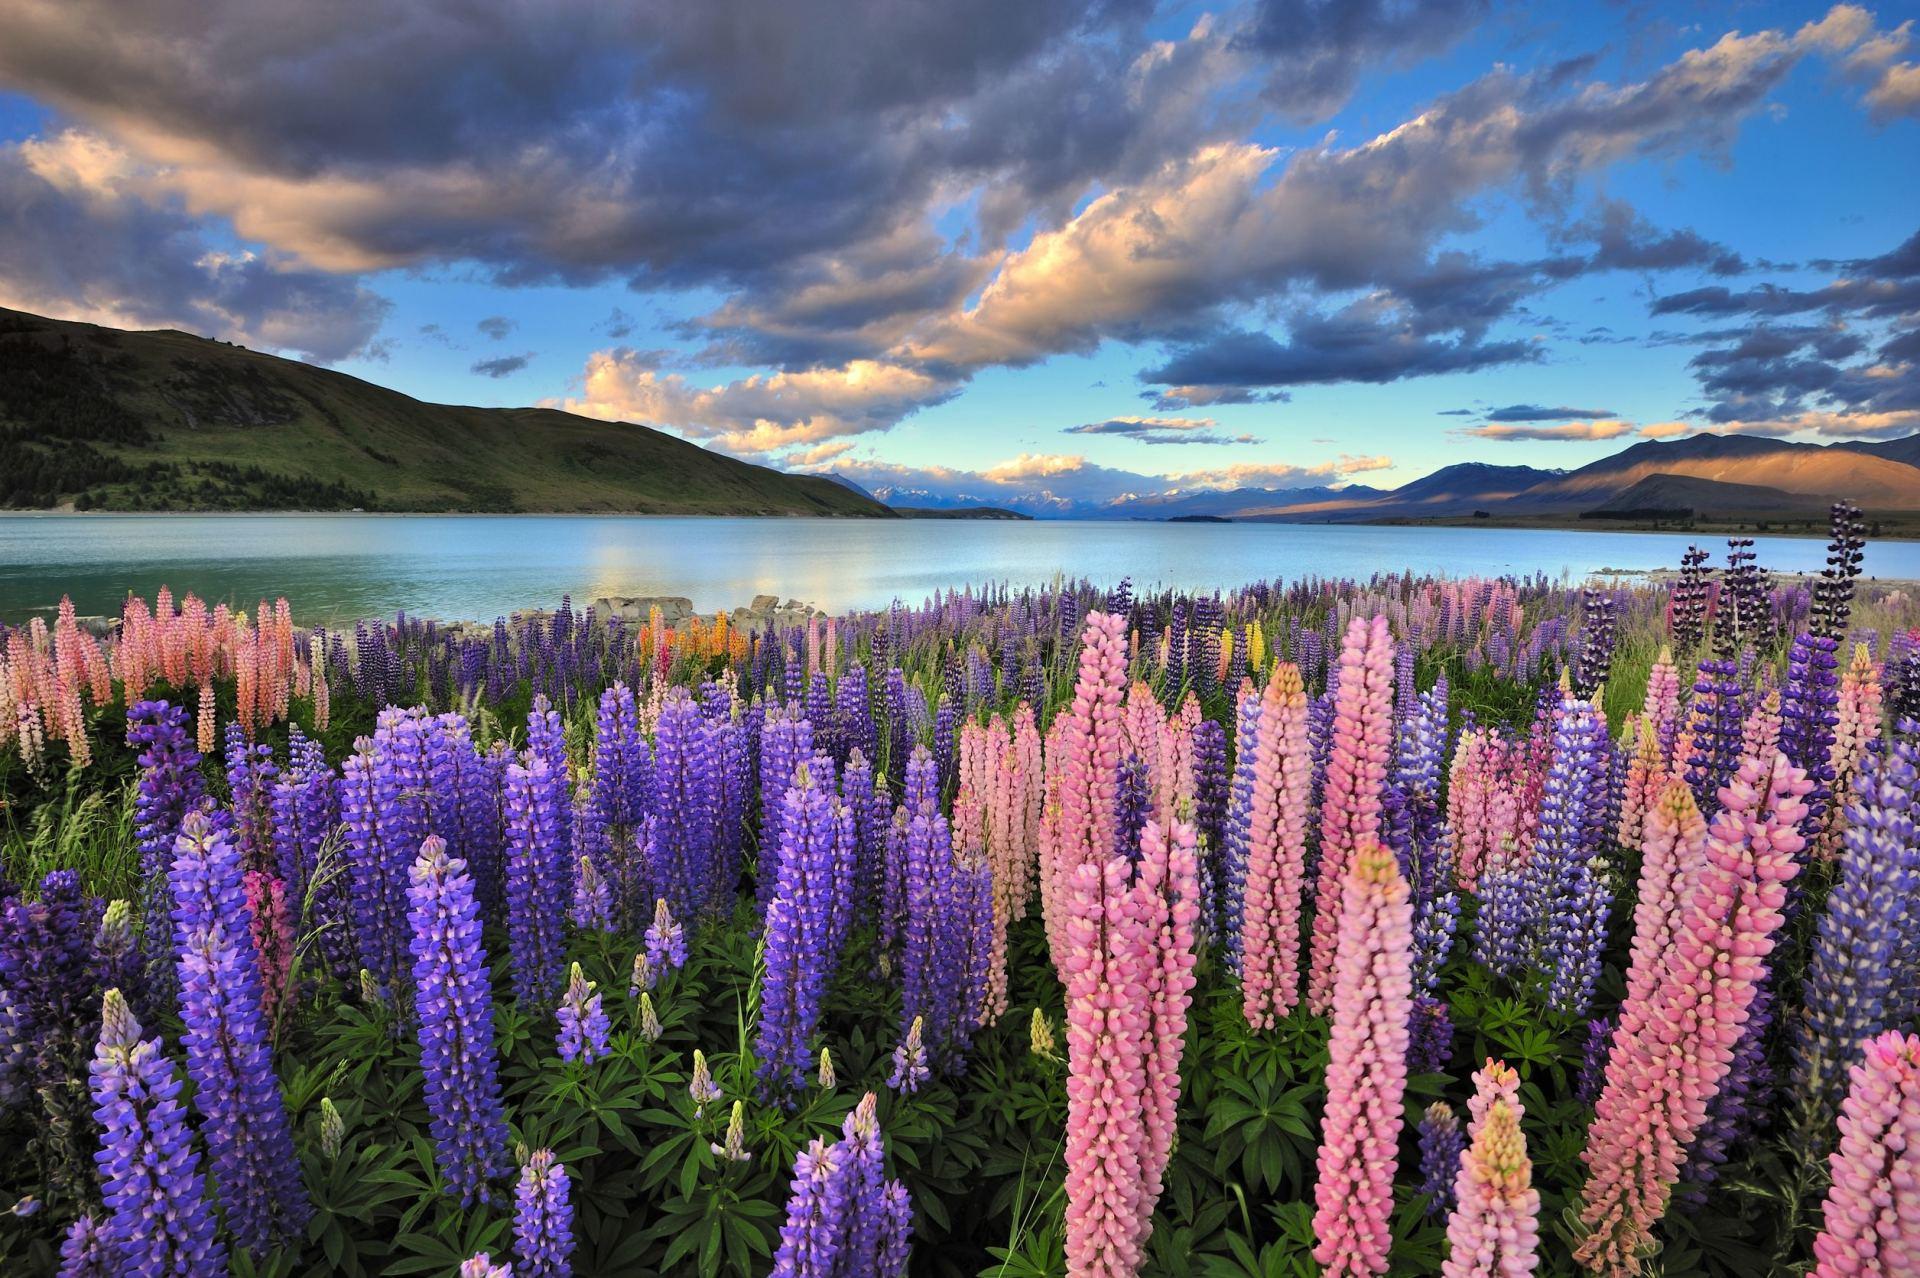 tavo širdies sveikata Naujoji Zelandija sveikatos skatinimas sergant širdies ligomis